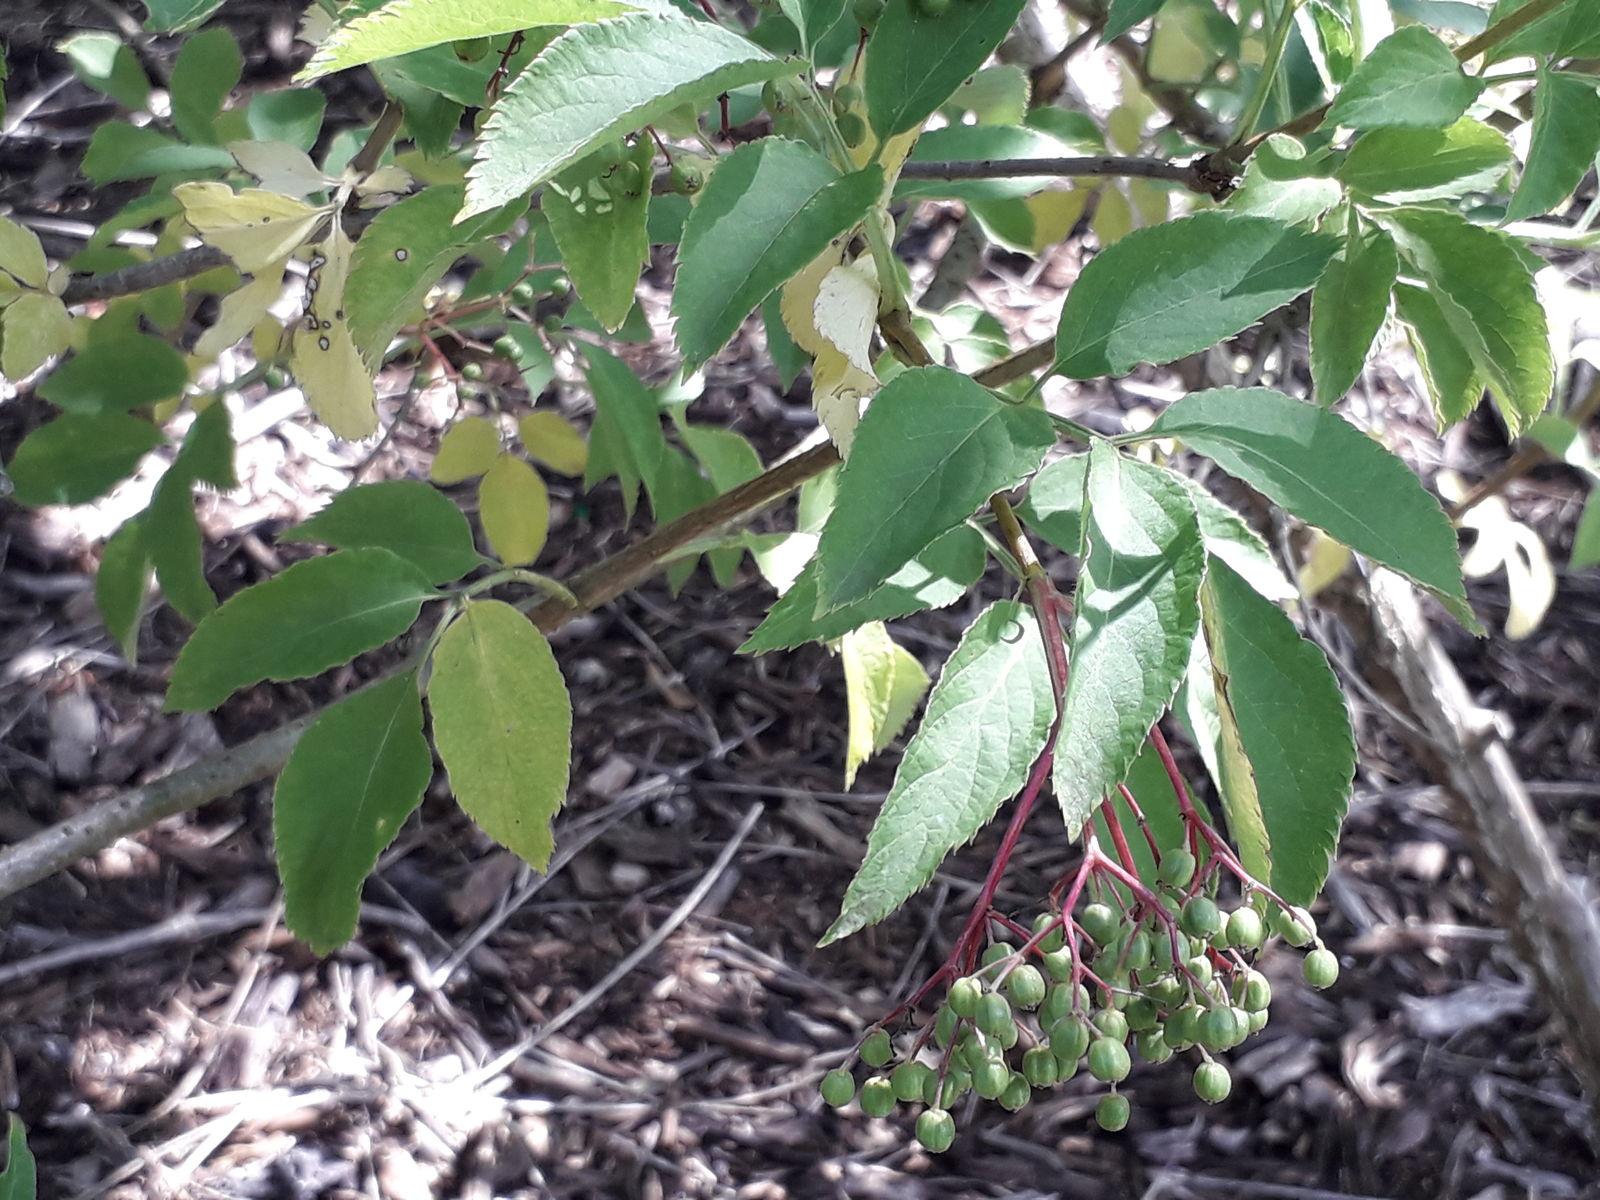 Sambucus williamsii Hance | Plants of the World Online | Kew Science